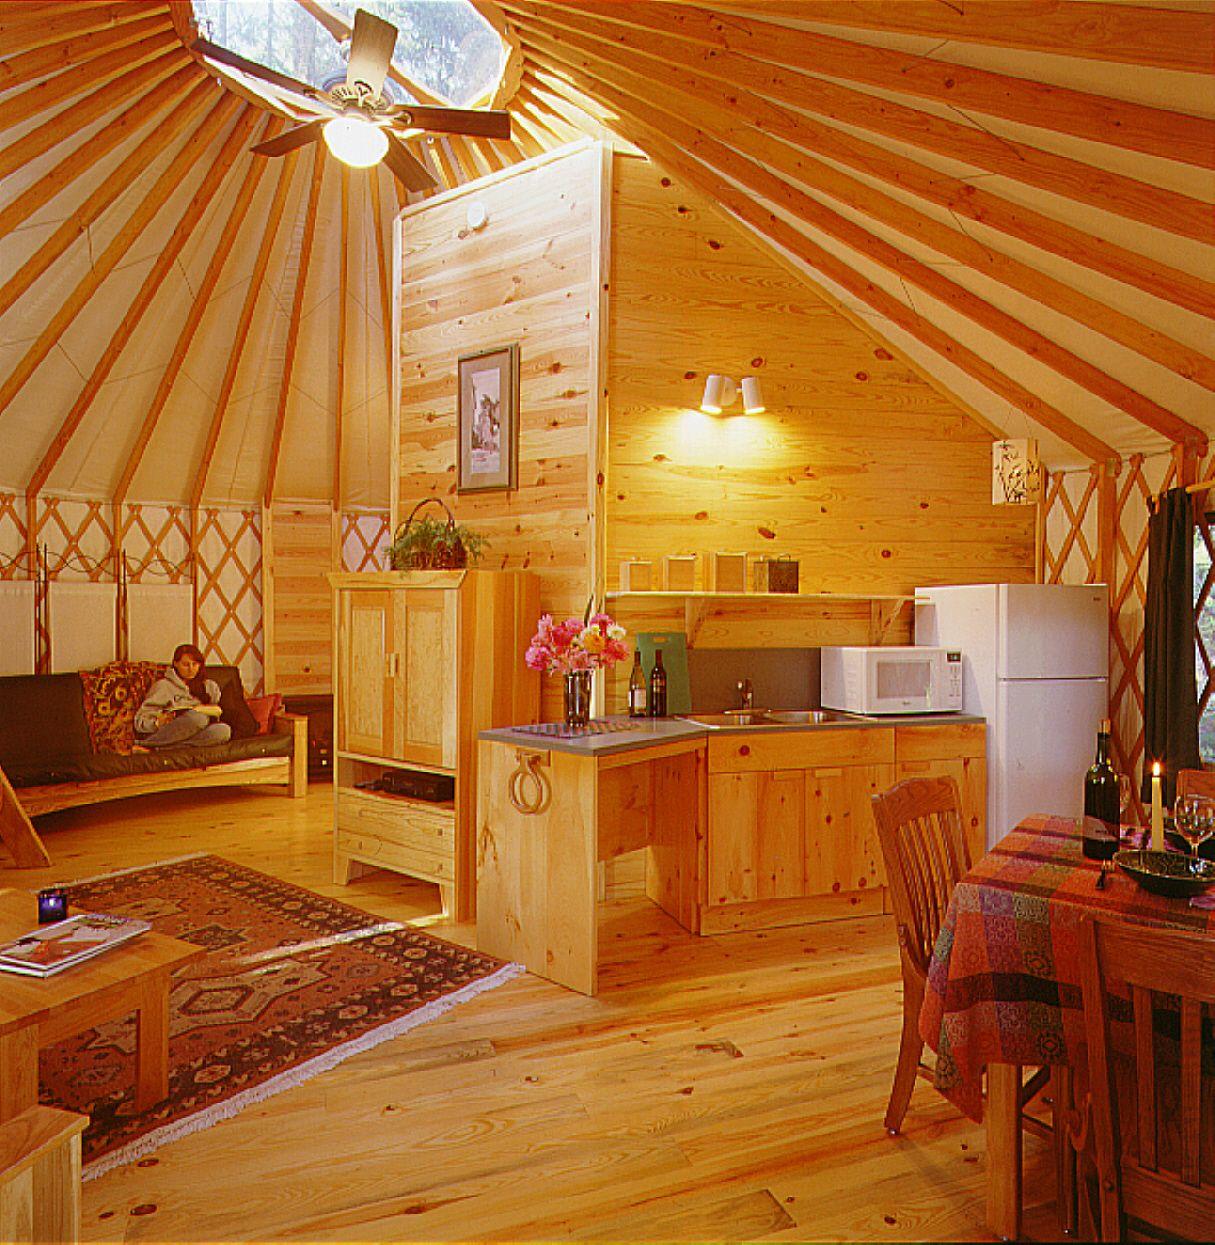 pictursof yurts | deluxe yurt interior at umpqua lighthouse state